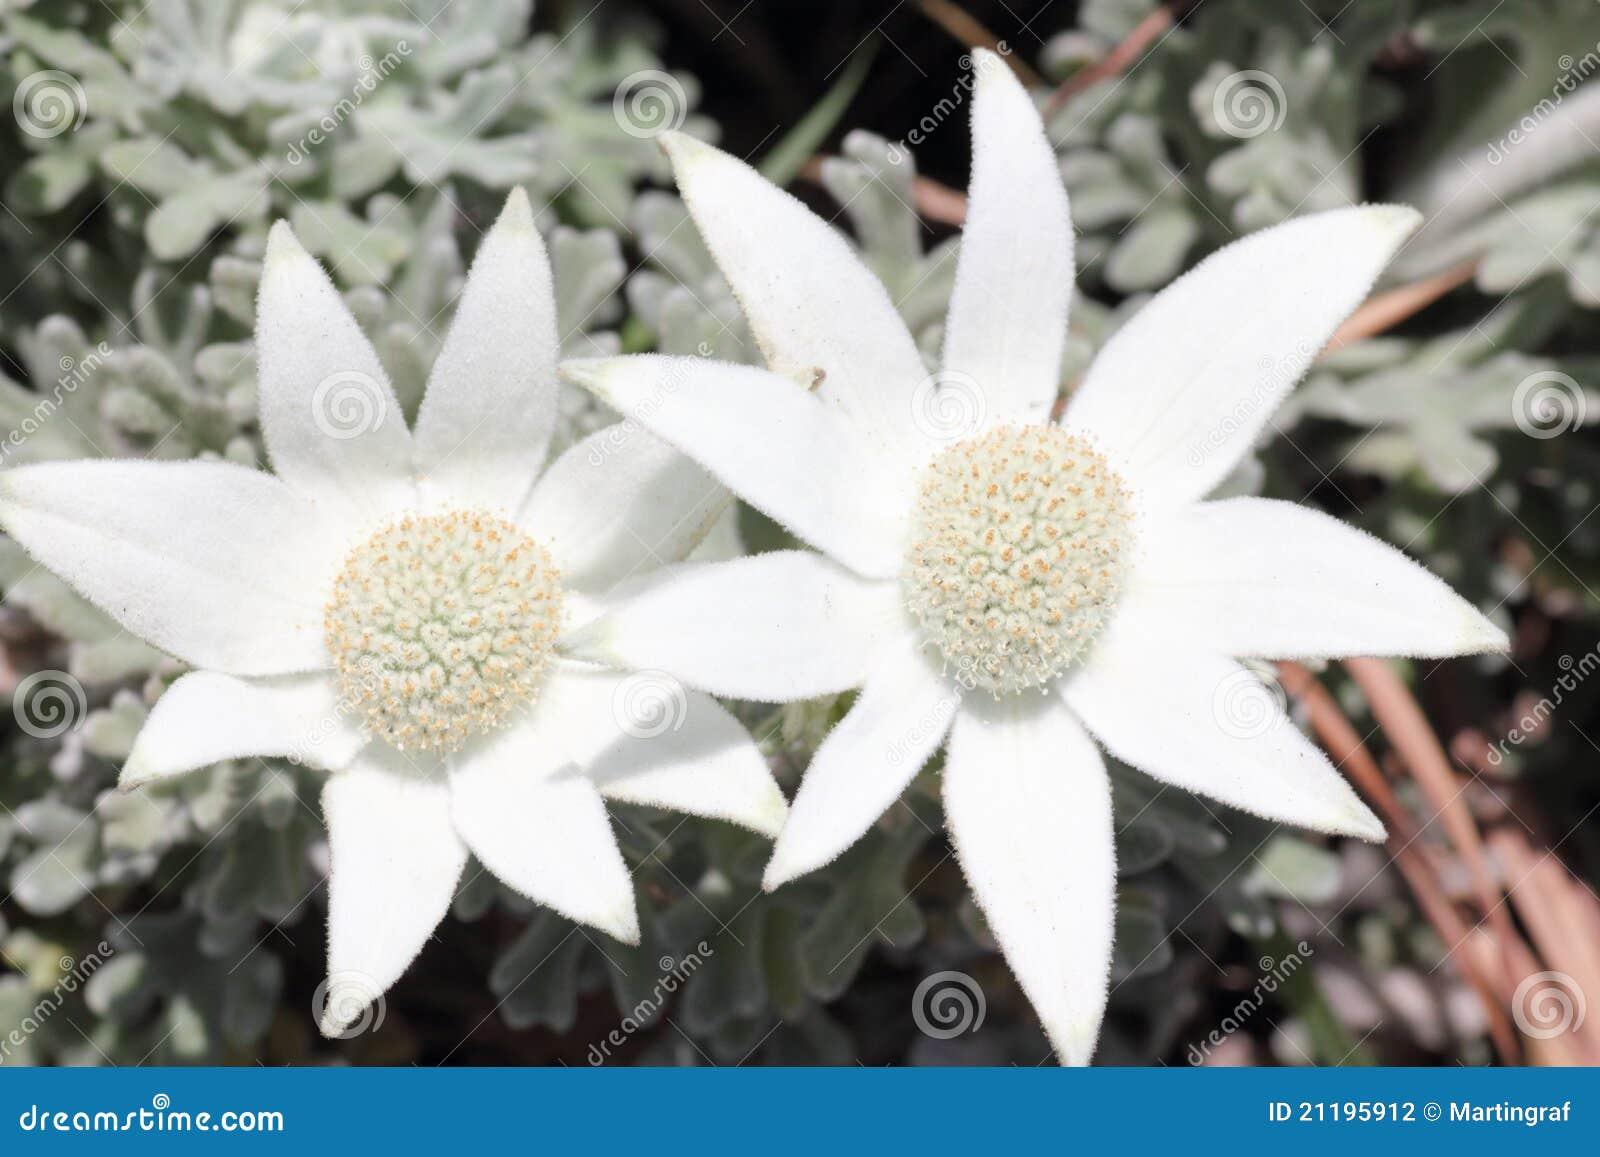 Flannel flower white bloom in heathland stock photo image of flannel flower white bloom in heathland mightylinksfo